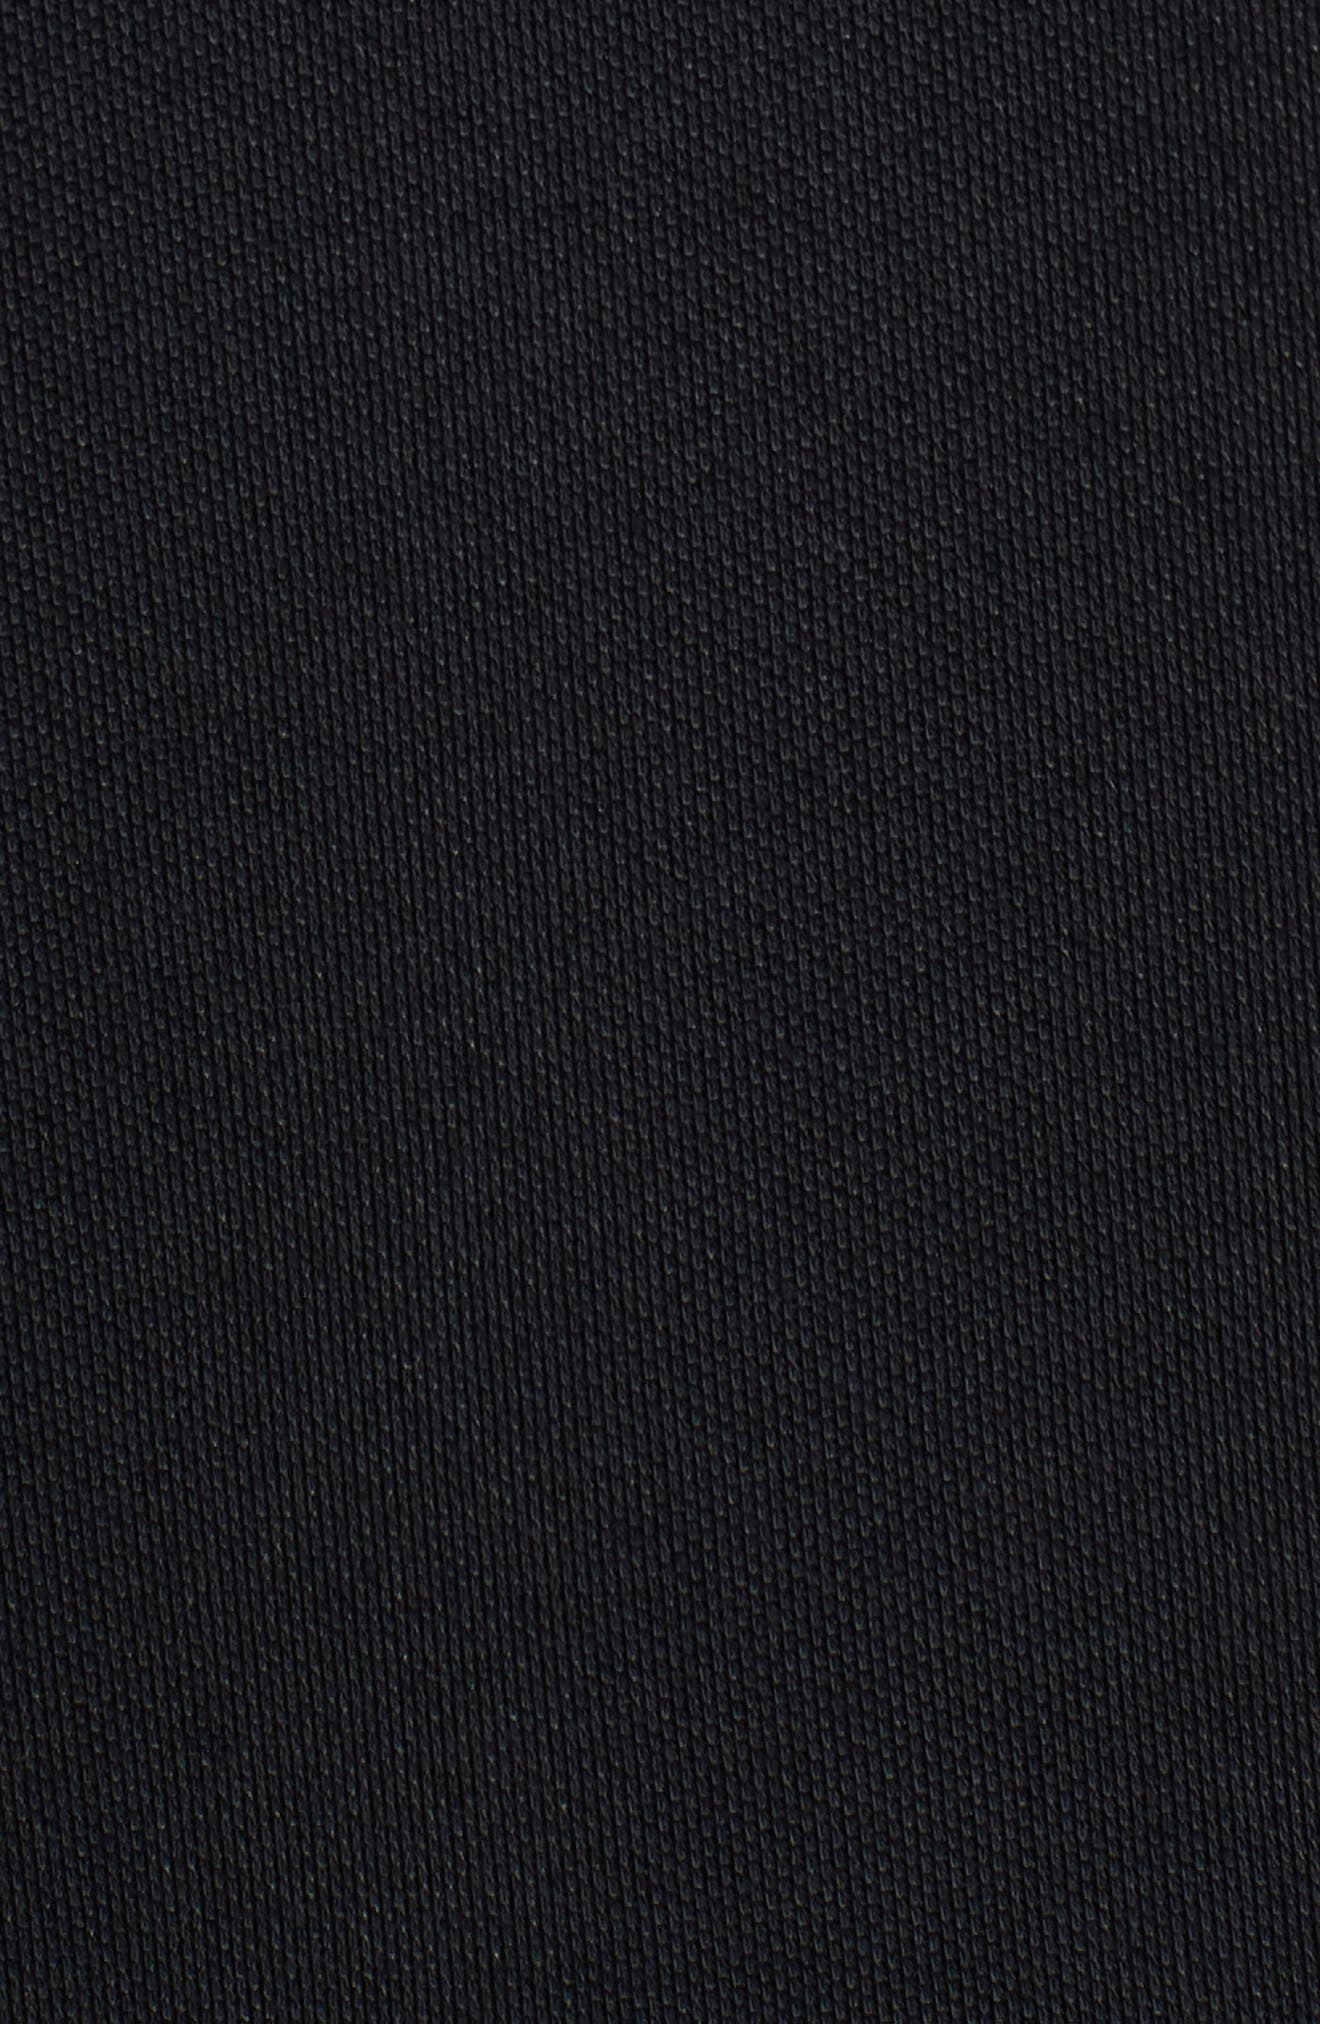 Pittsburgh Steelers - Advantage Regular Fit DryTec Polo,                             Alternate thumbnail 5, color,                             001